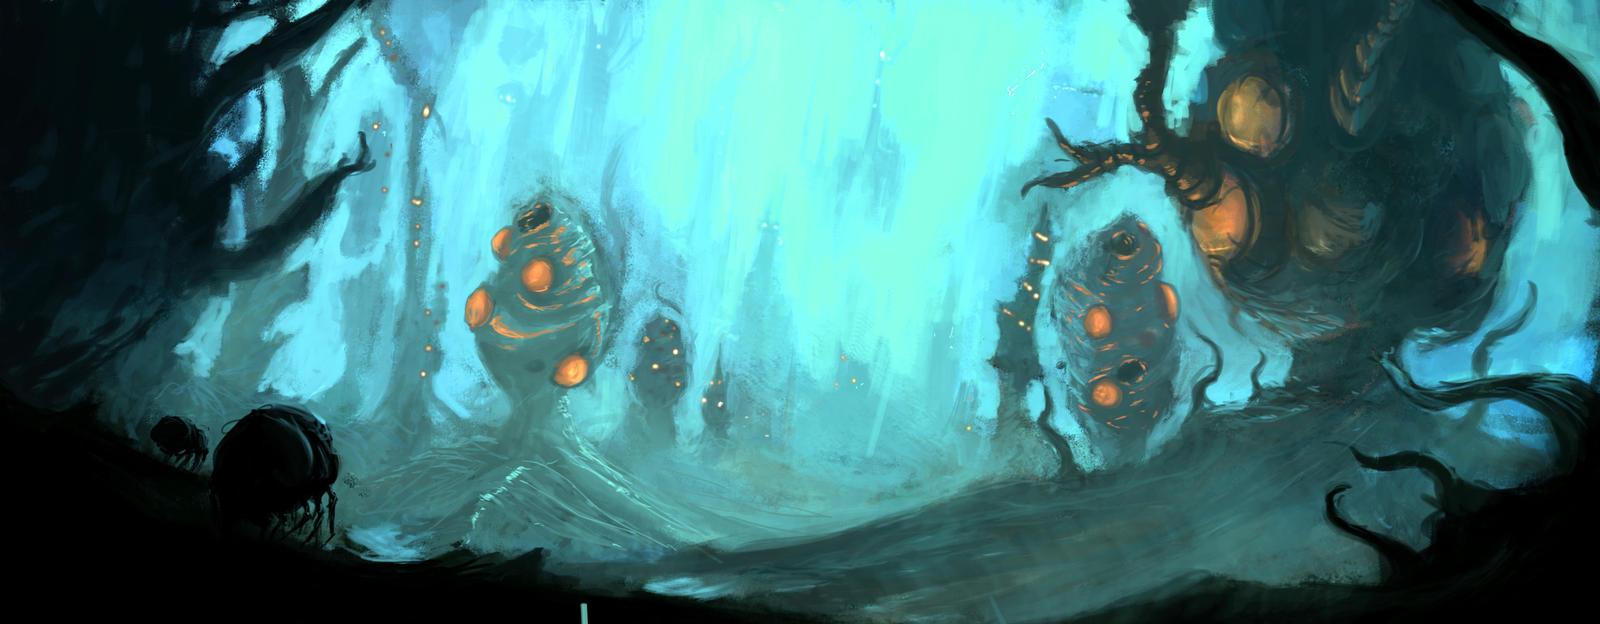 Alien Pods by Goottipoju